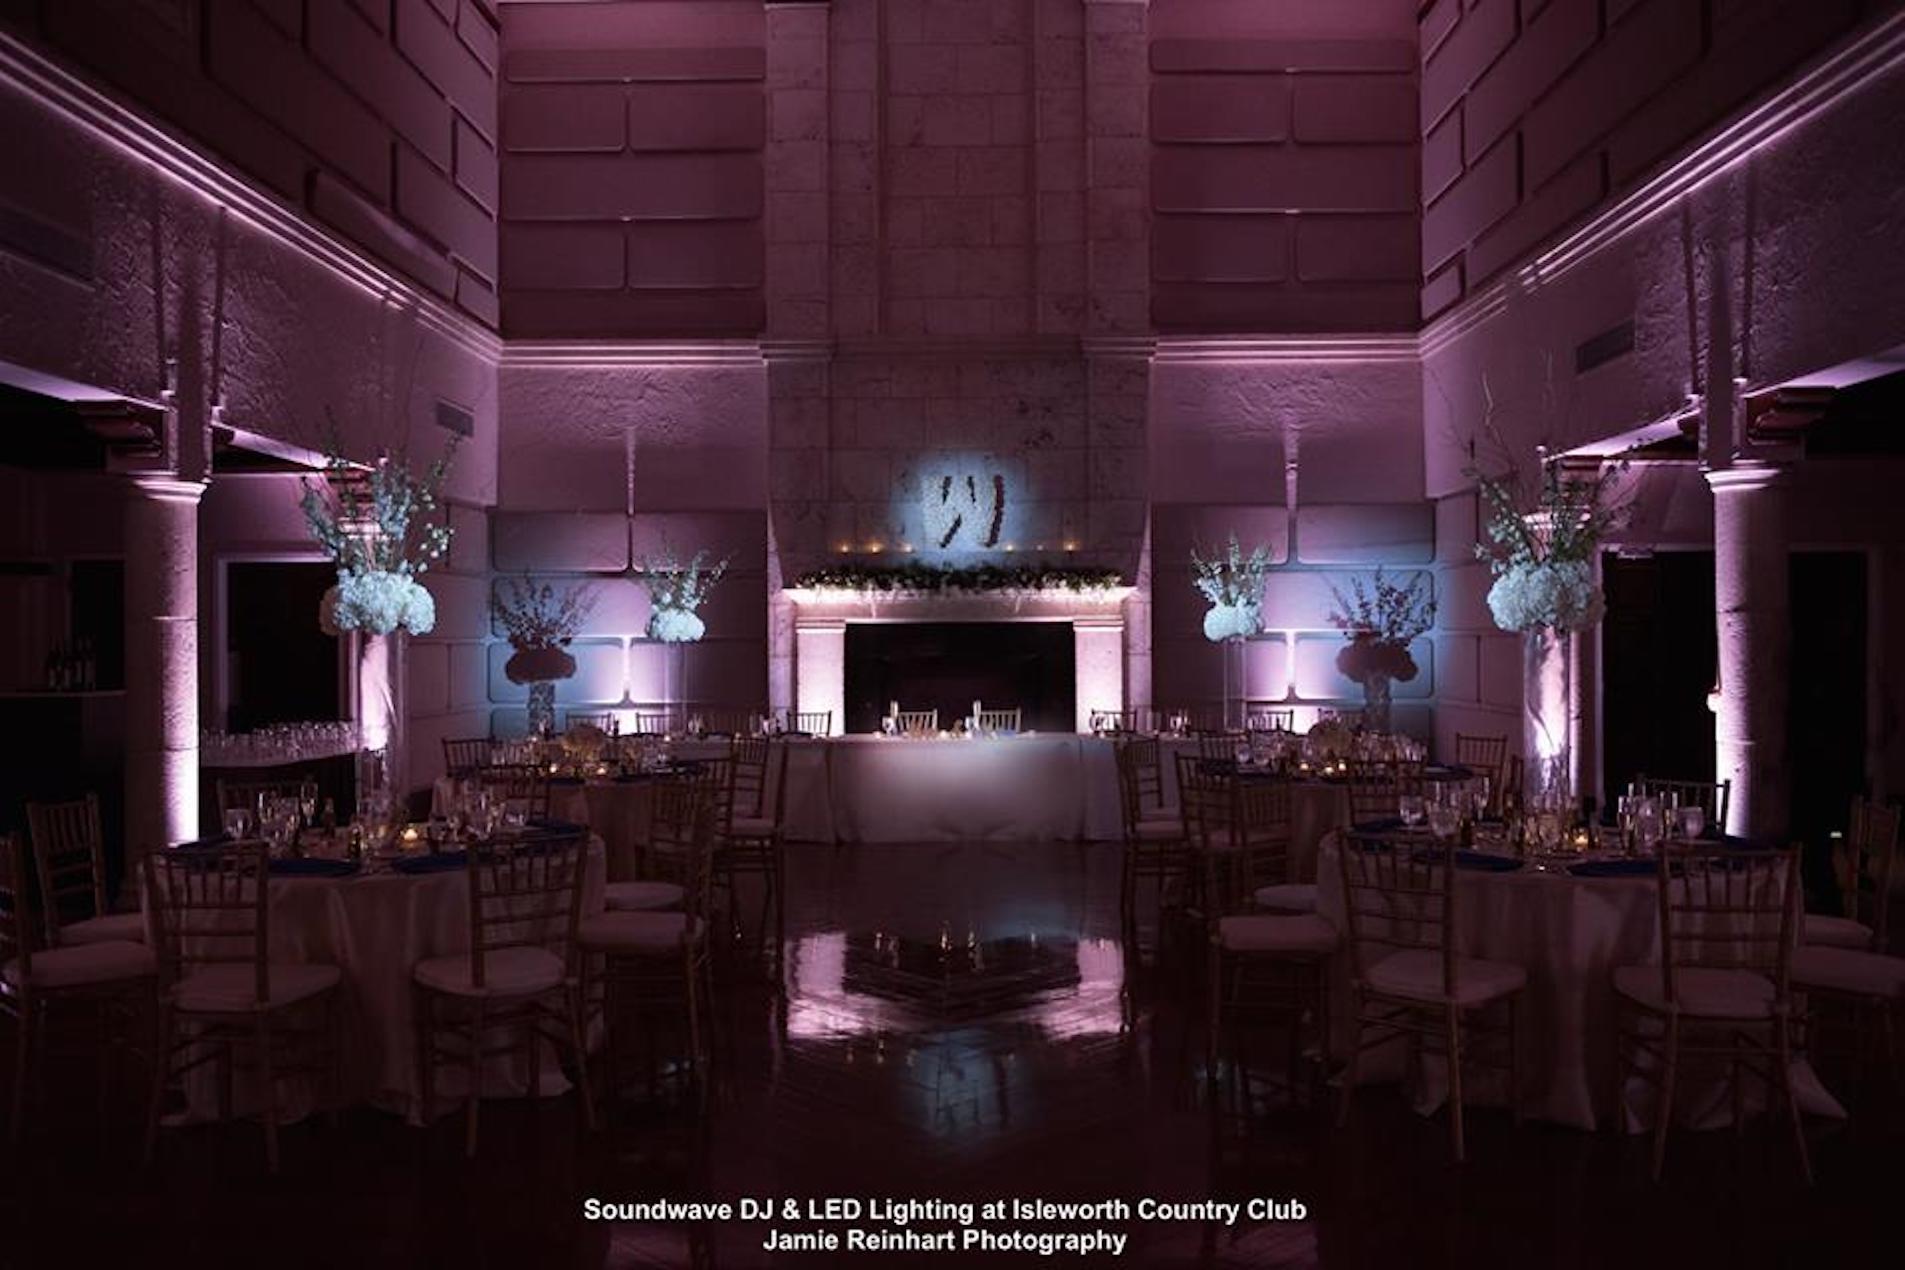 soundwave entertainment - isleworth country club - orlando wedding venue - orlando, fl